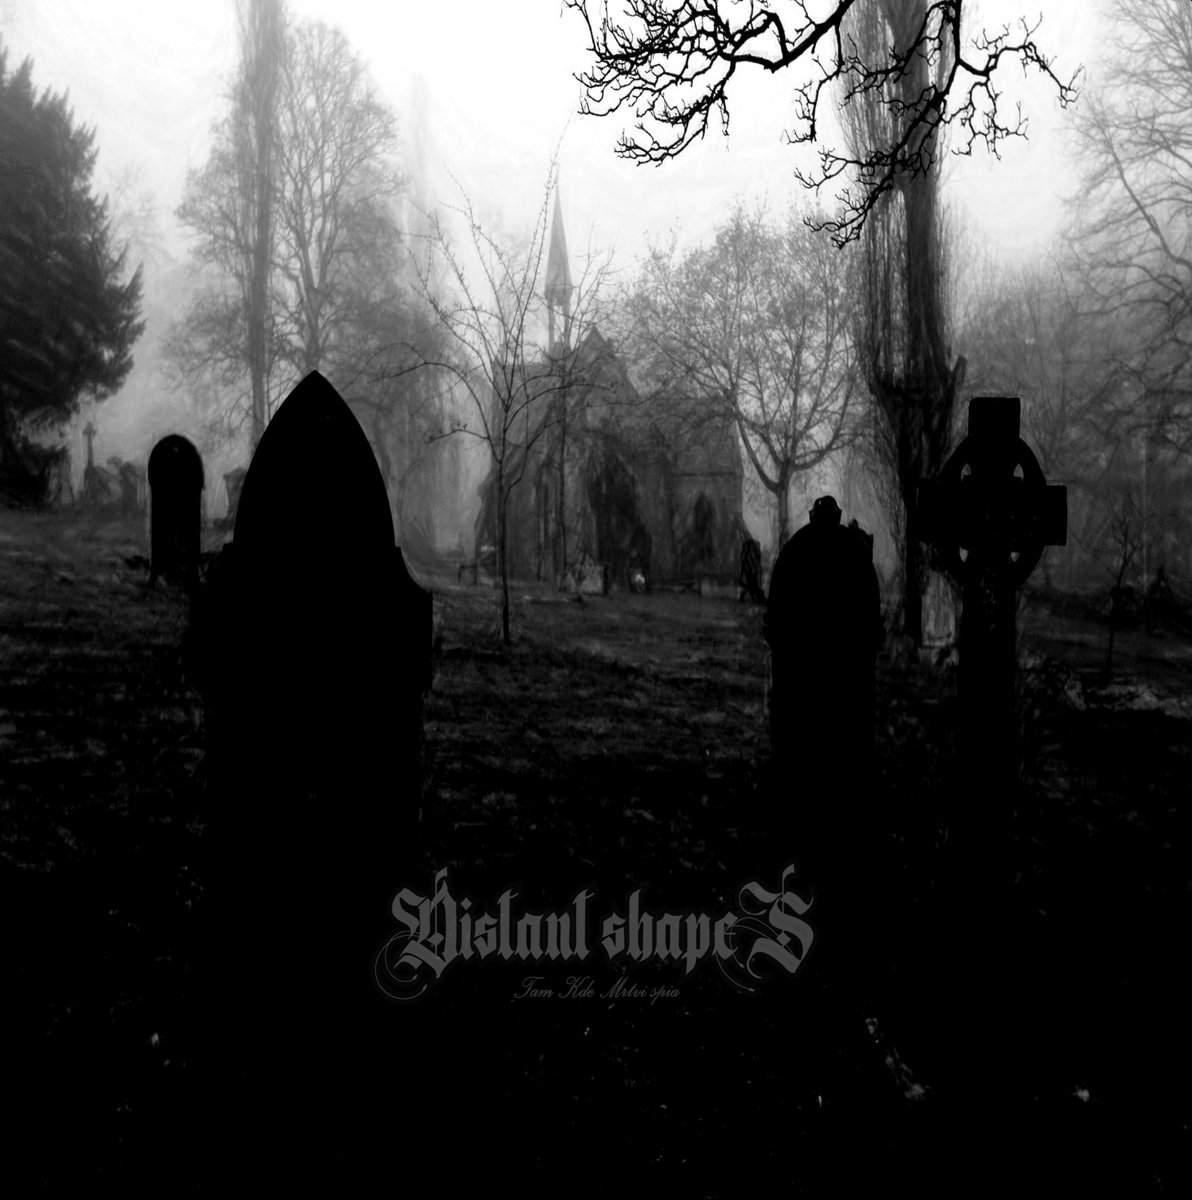 Distant Shapes - Tam Kde Mŕtvi Spia